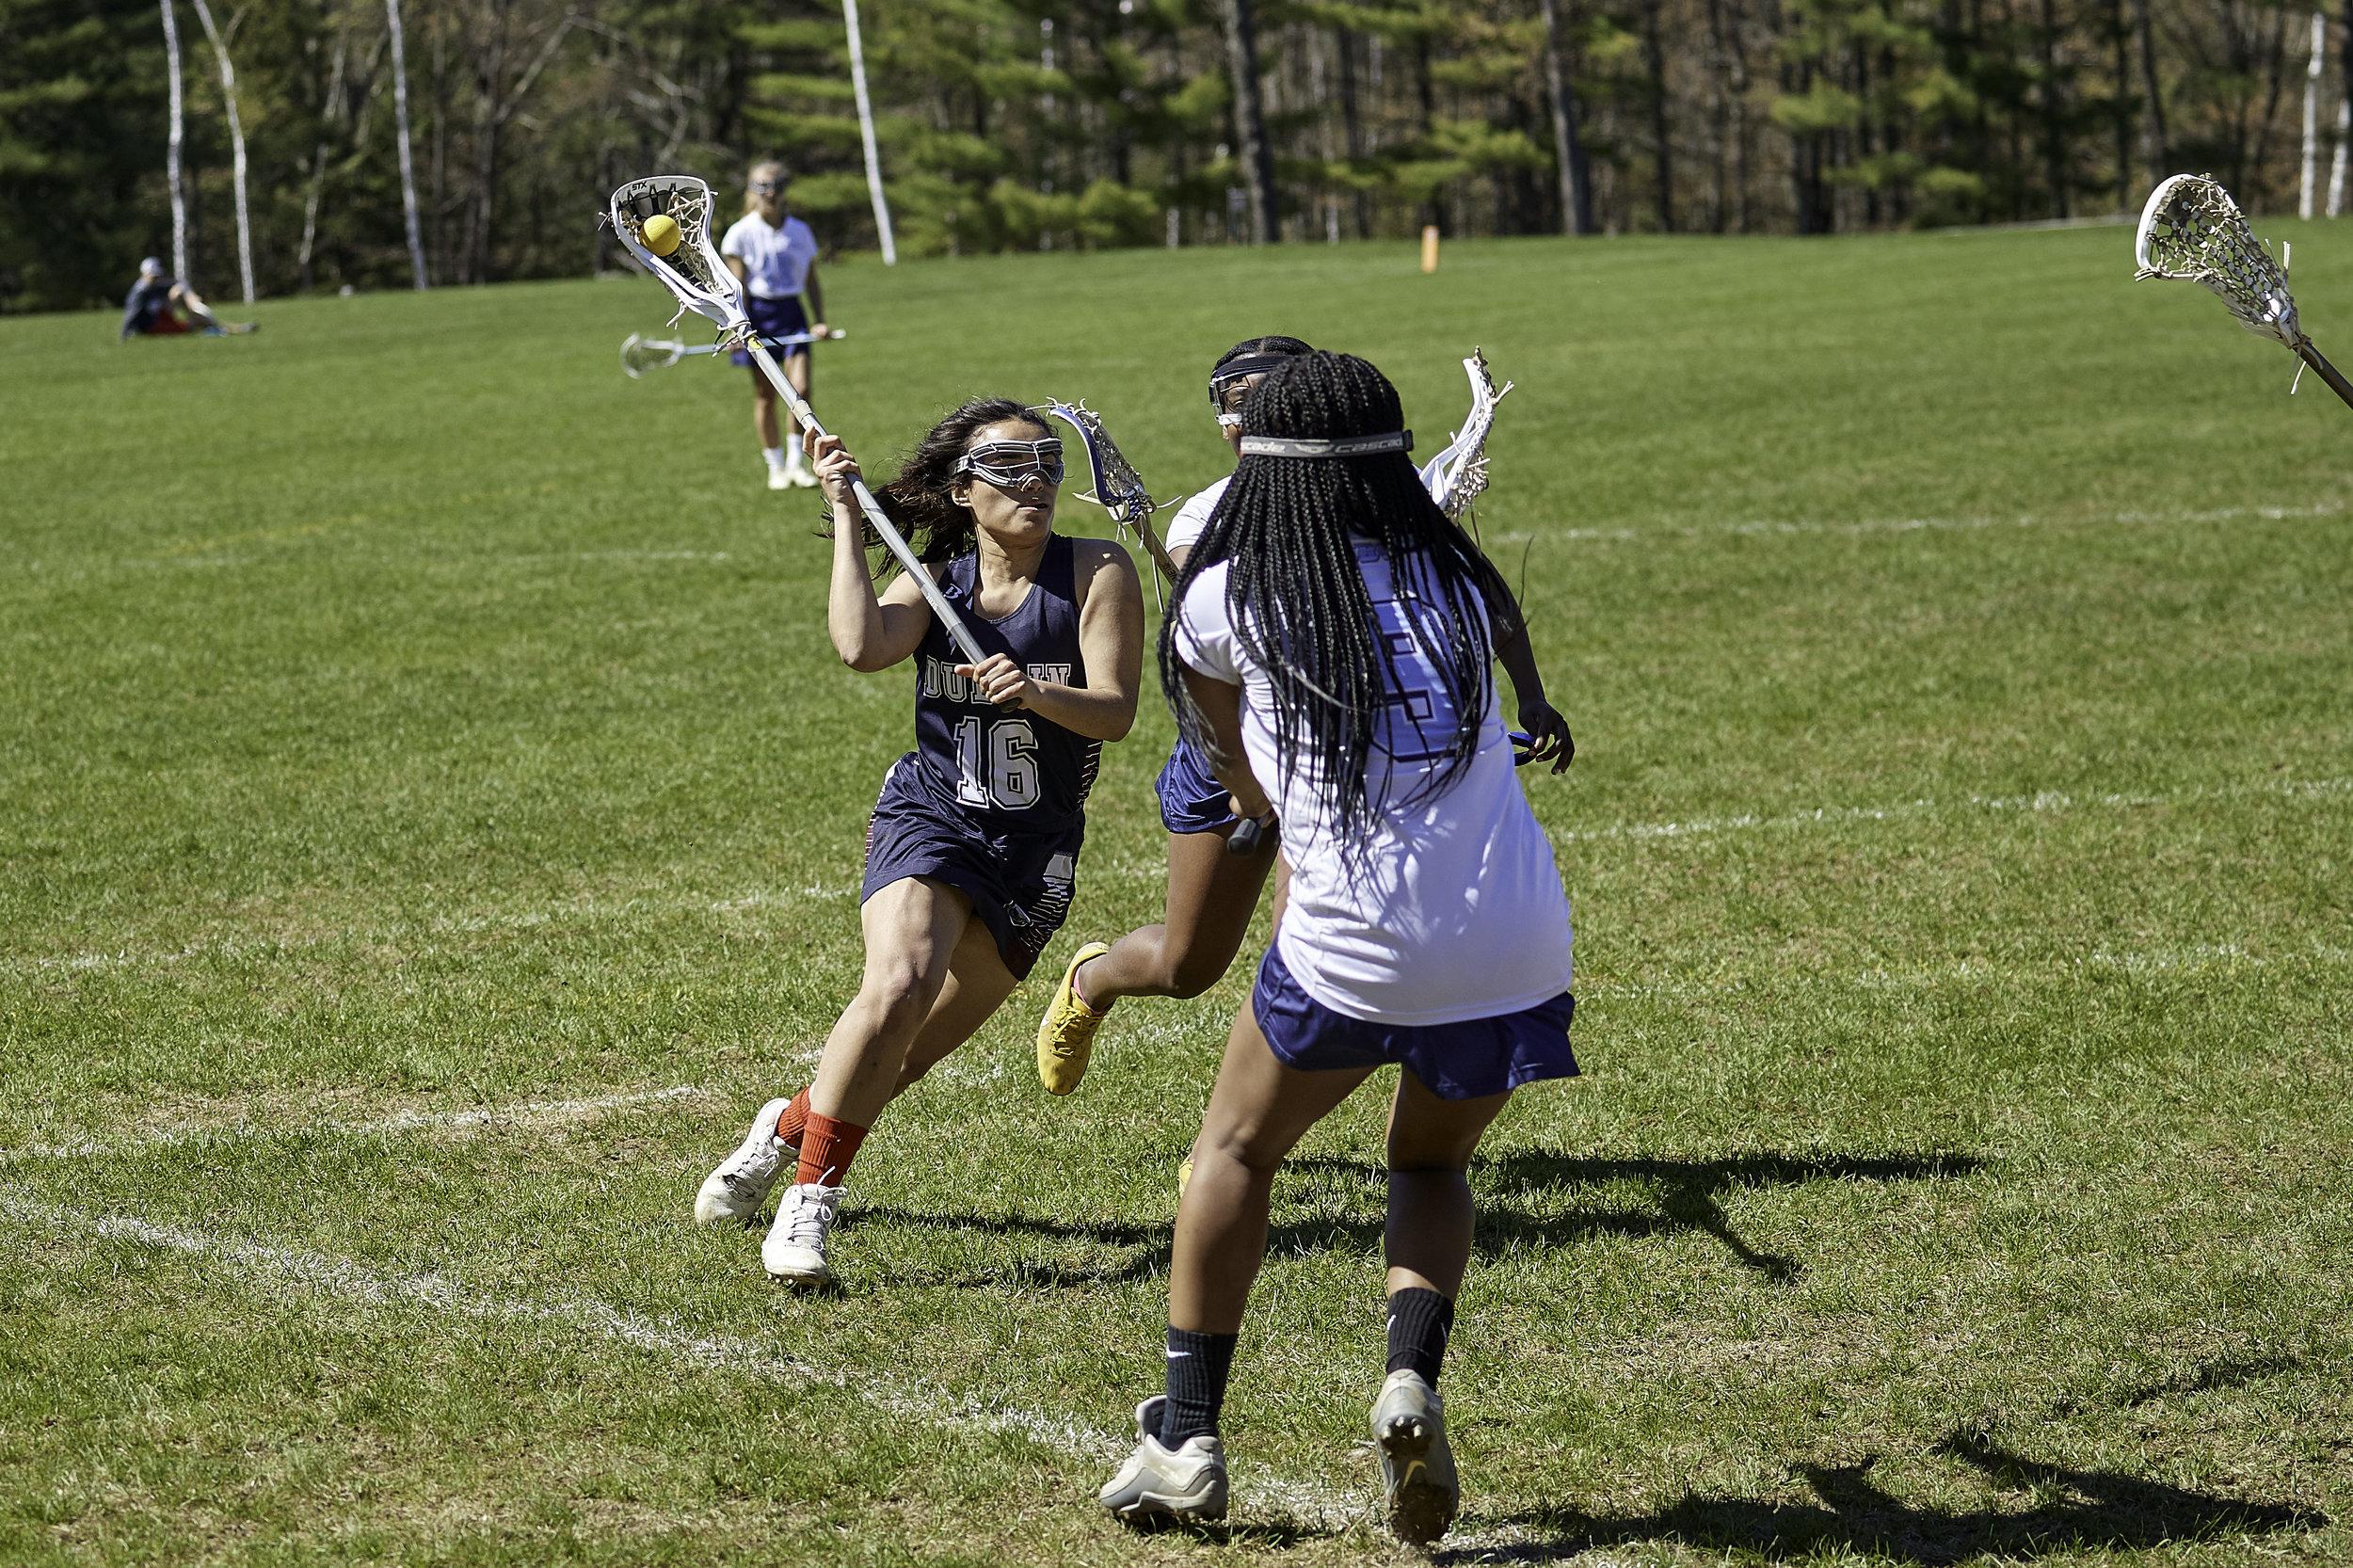 Girls Lacrosse vs. Stoneleigh Burnham School - May 11, 2019 - May 10, 2019193378.jpg